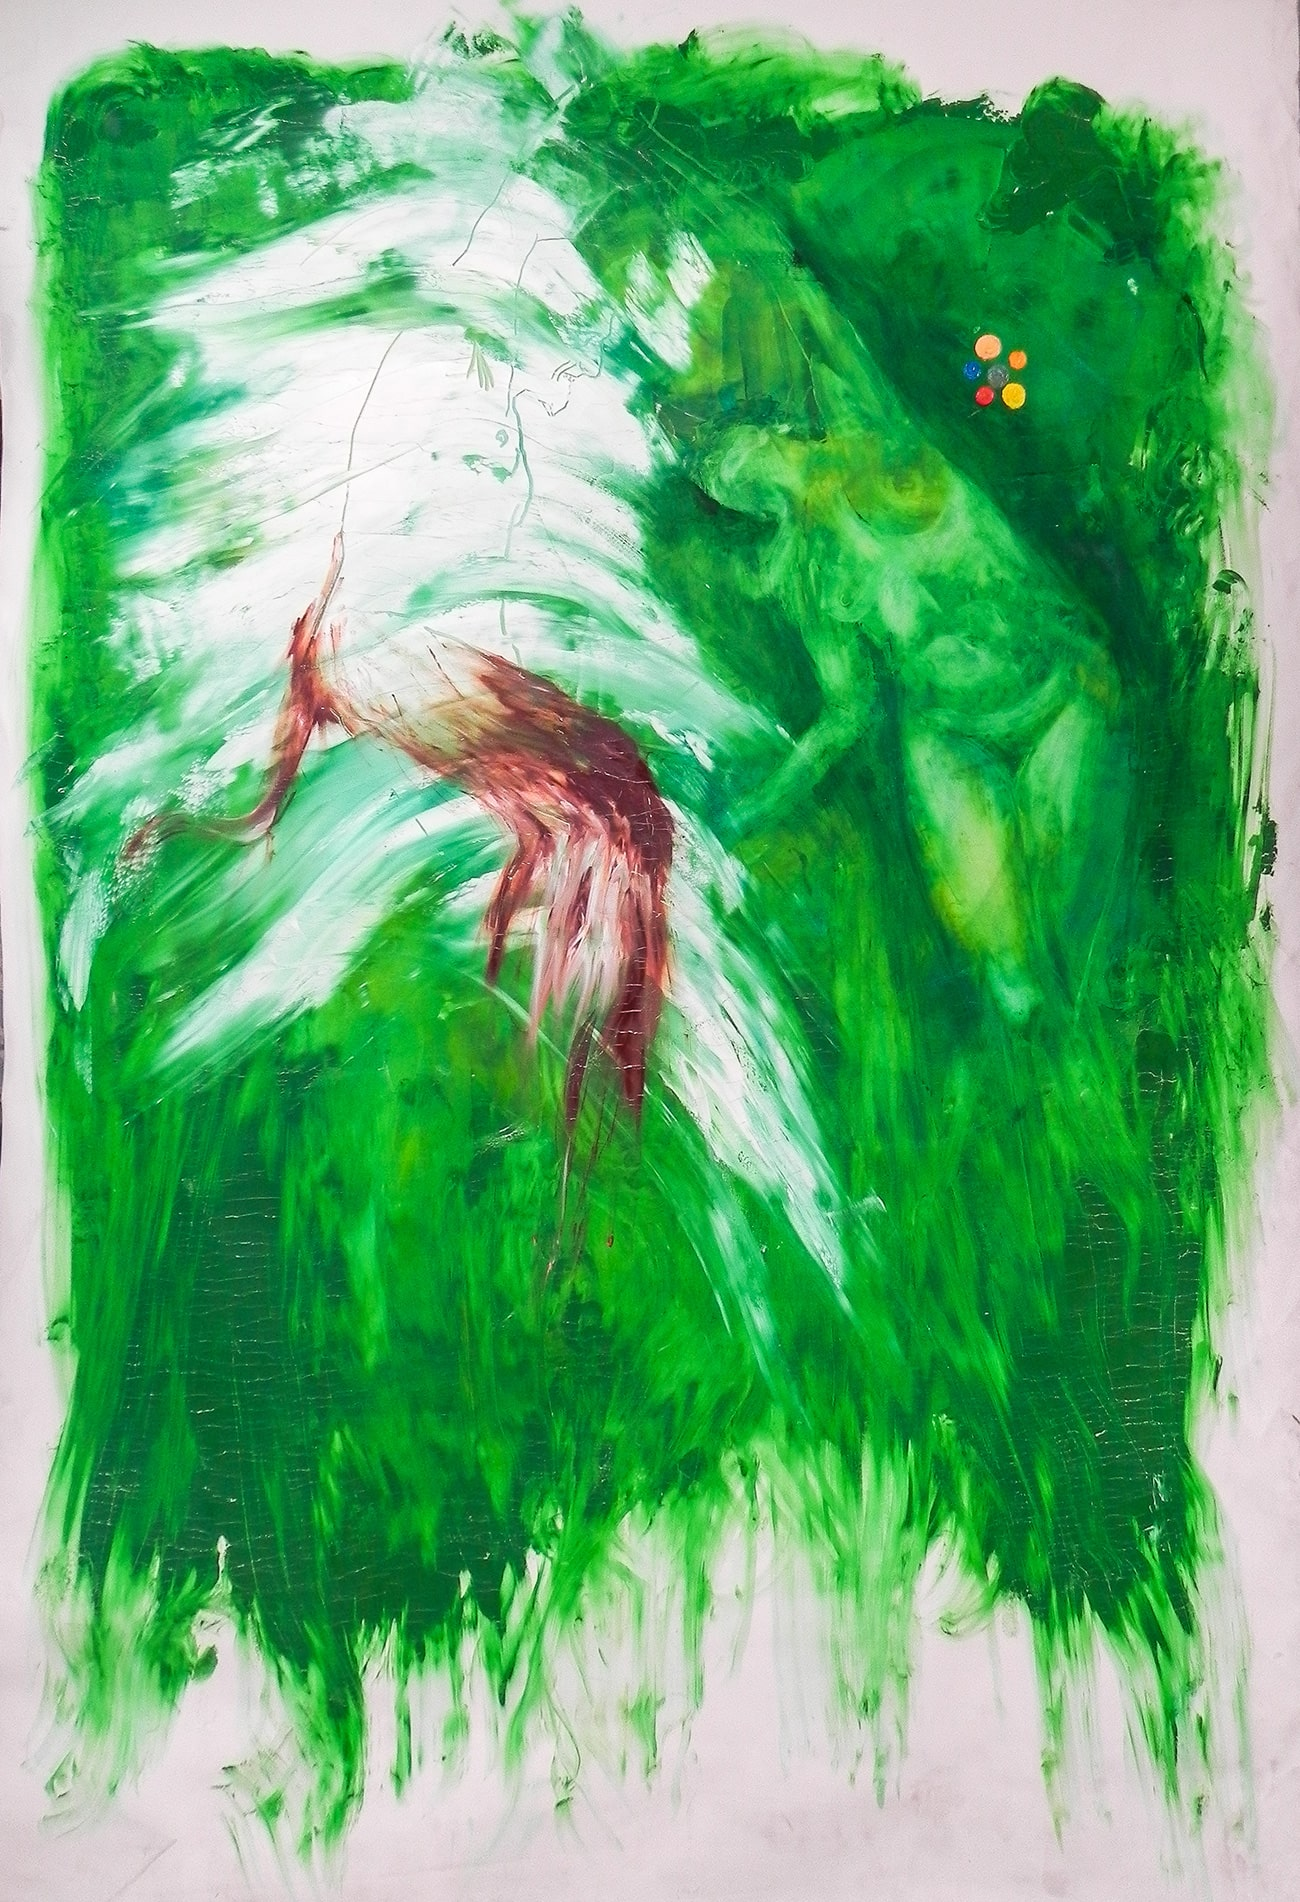 Green - Isabel Gómez Liebre